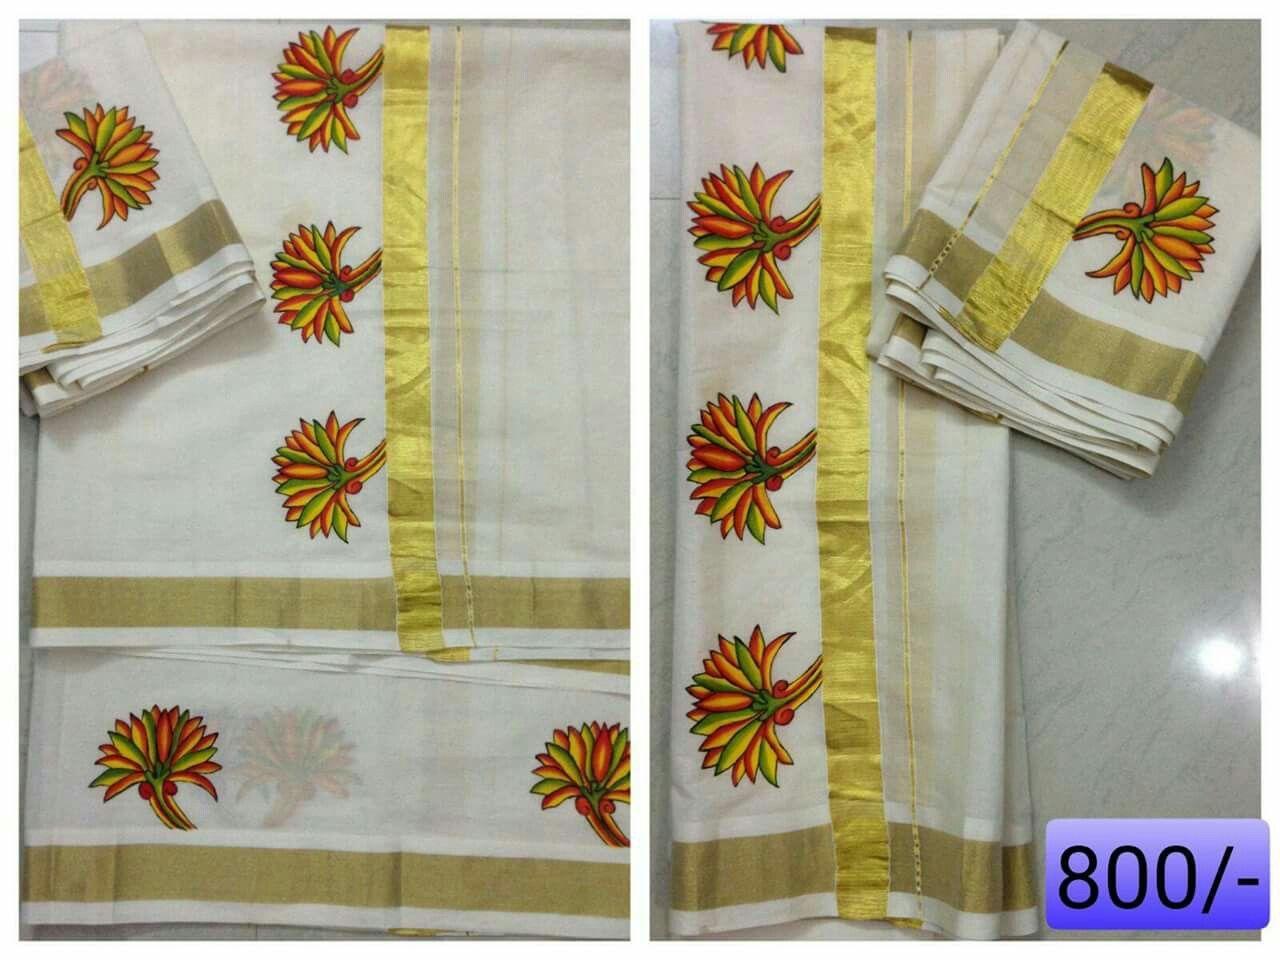 Pin by Ashwini Krishna on ❤ Mural ❤   Pinterest   Saree, Mural ... for Fabric Painting Designs For Kerala Sarees  67qdu